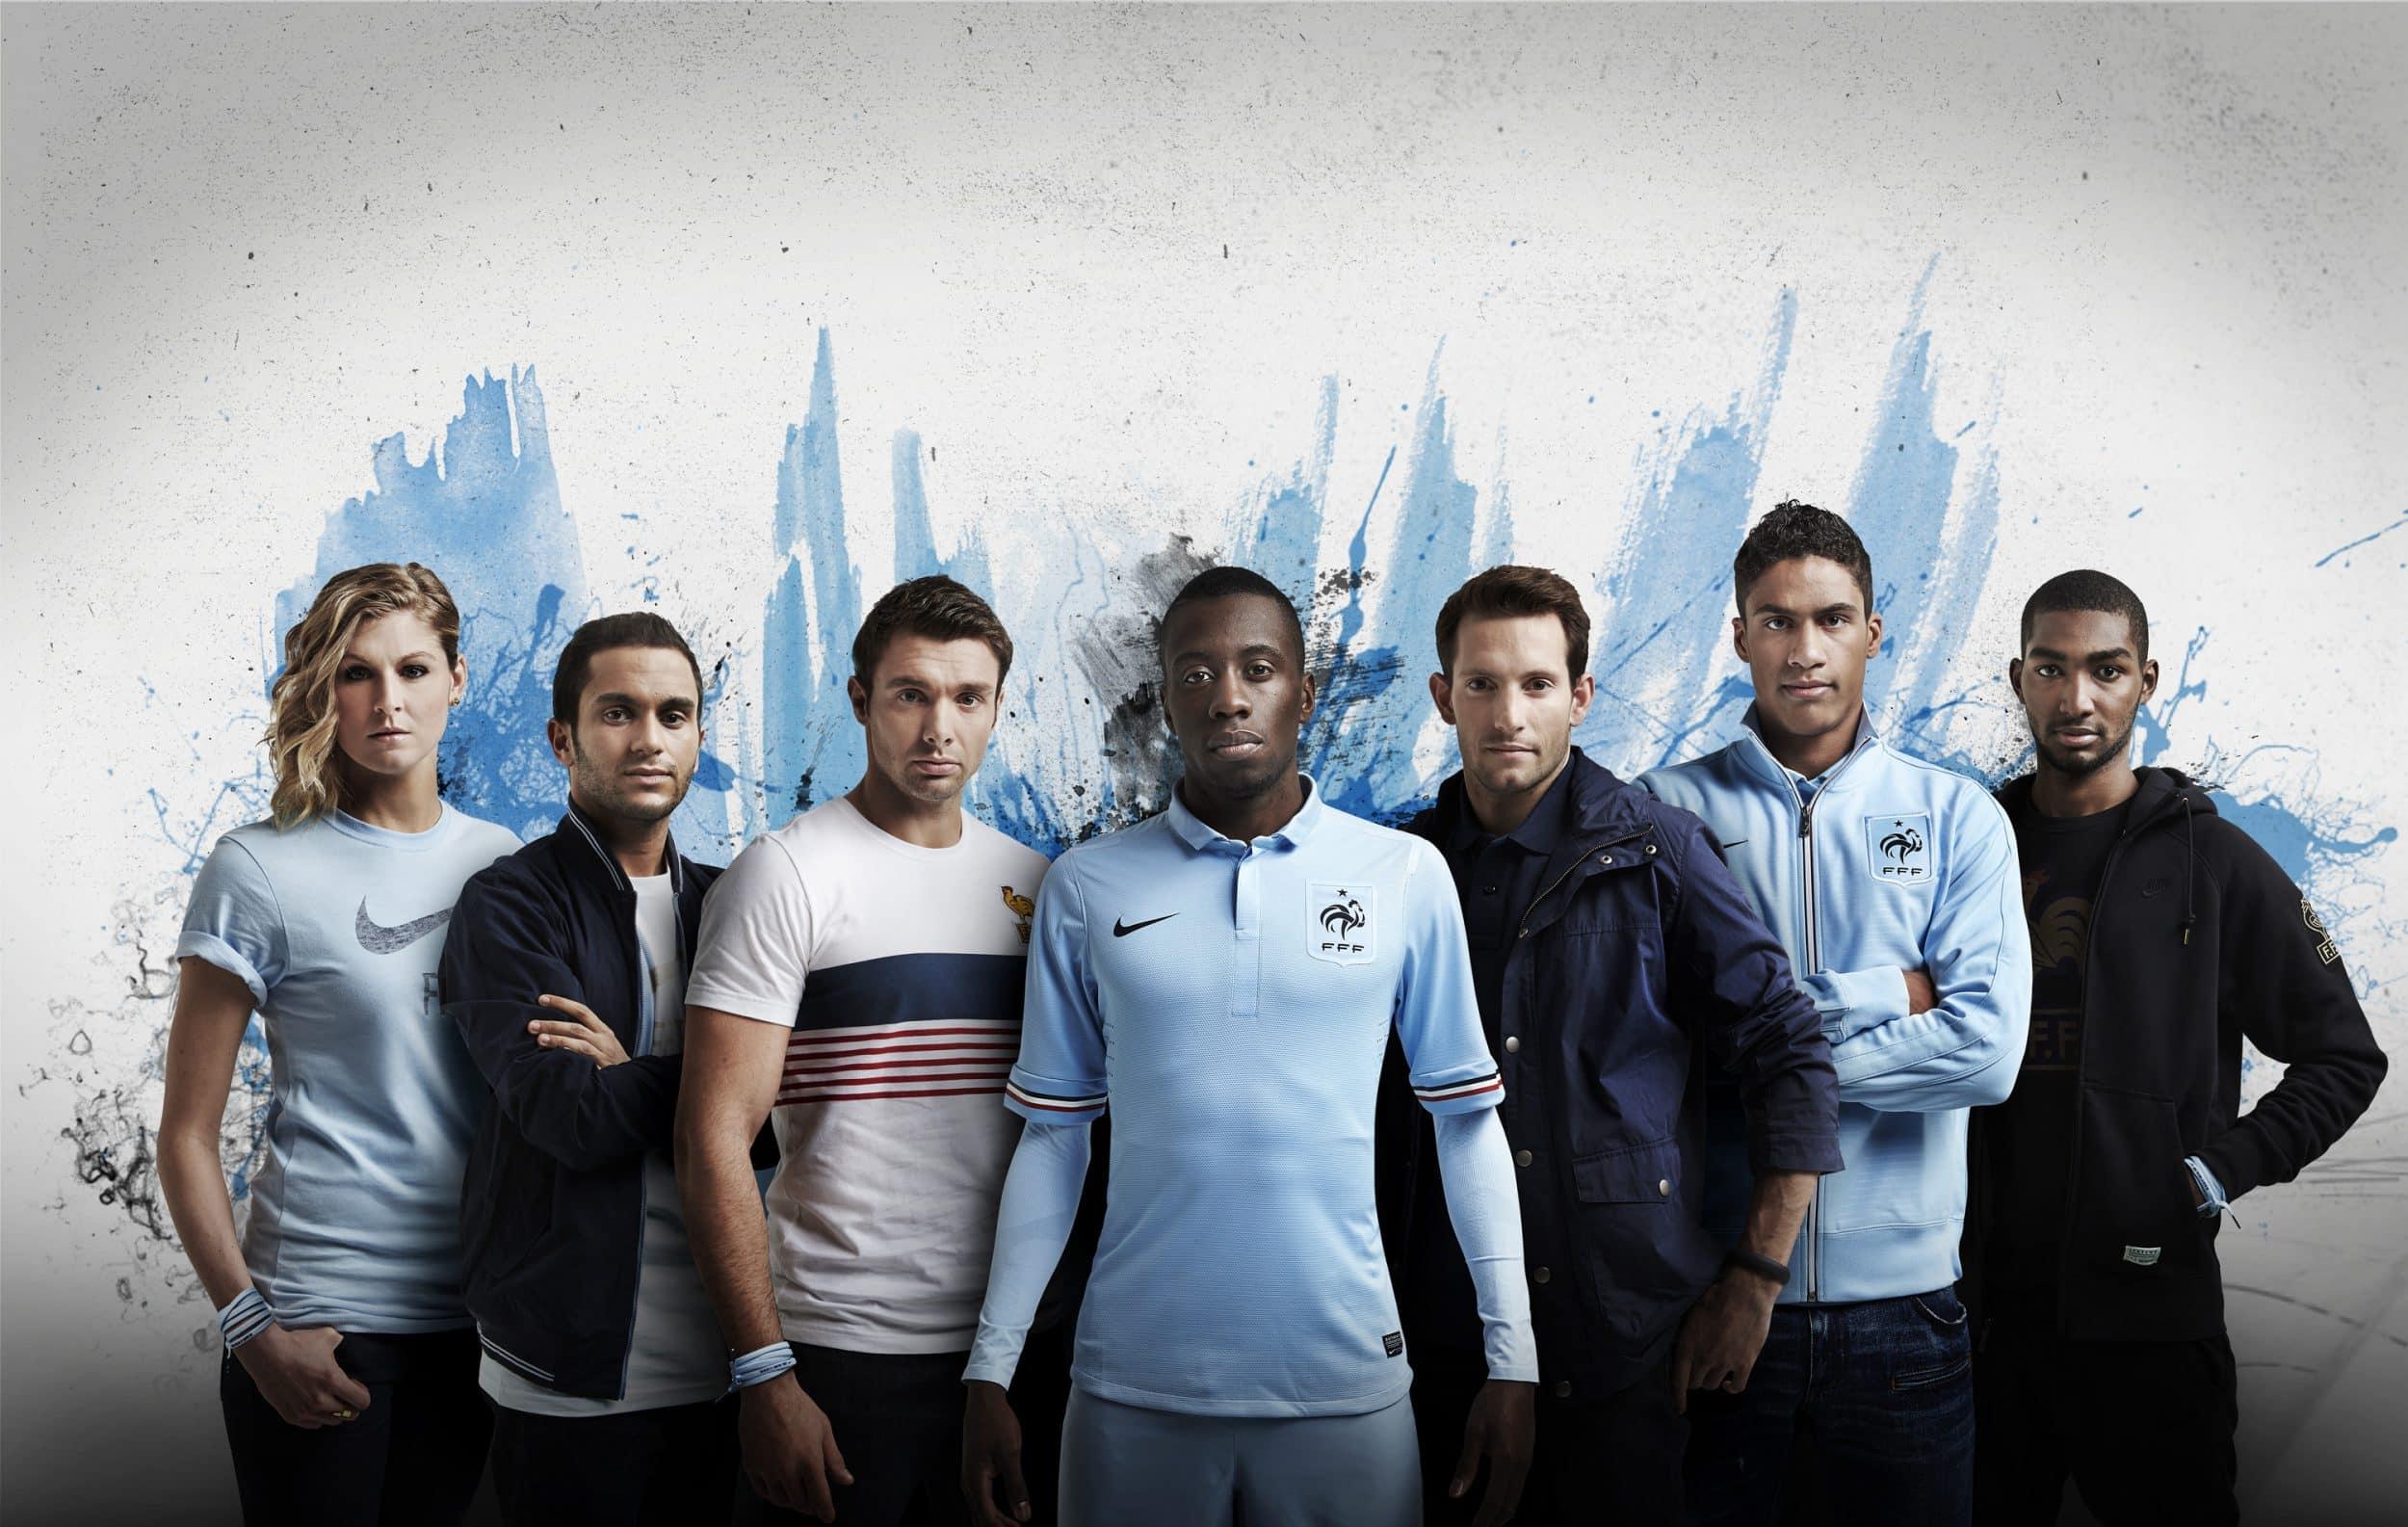 maillot-football-nike-equipe-de-france-exterieur-2013-img1